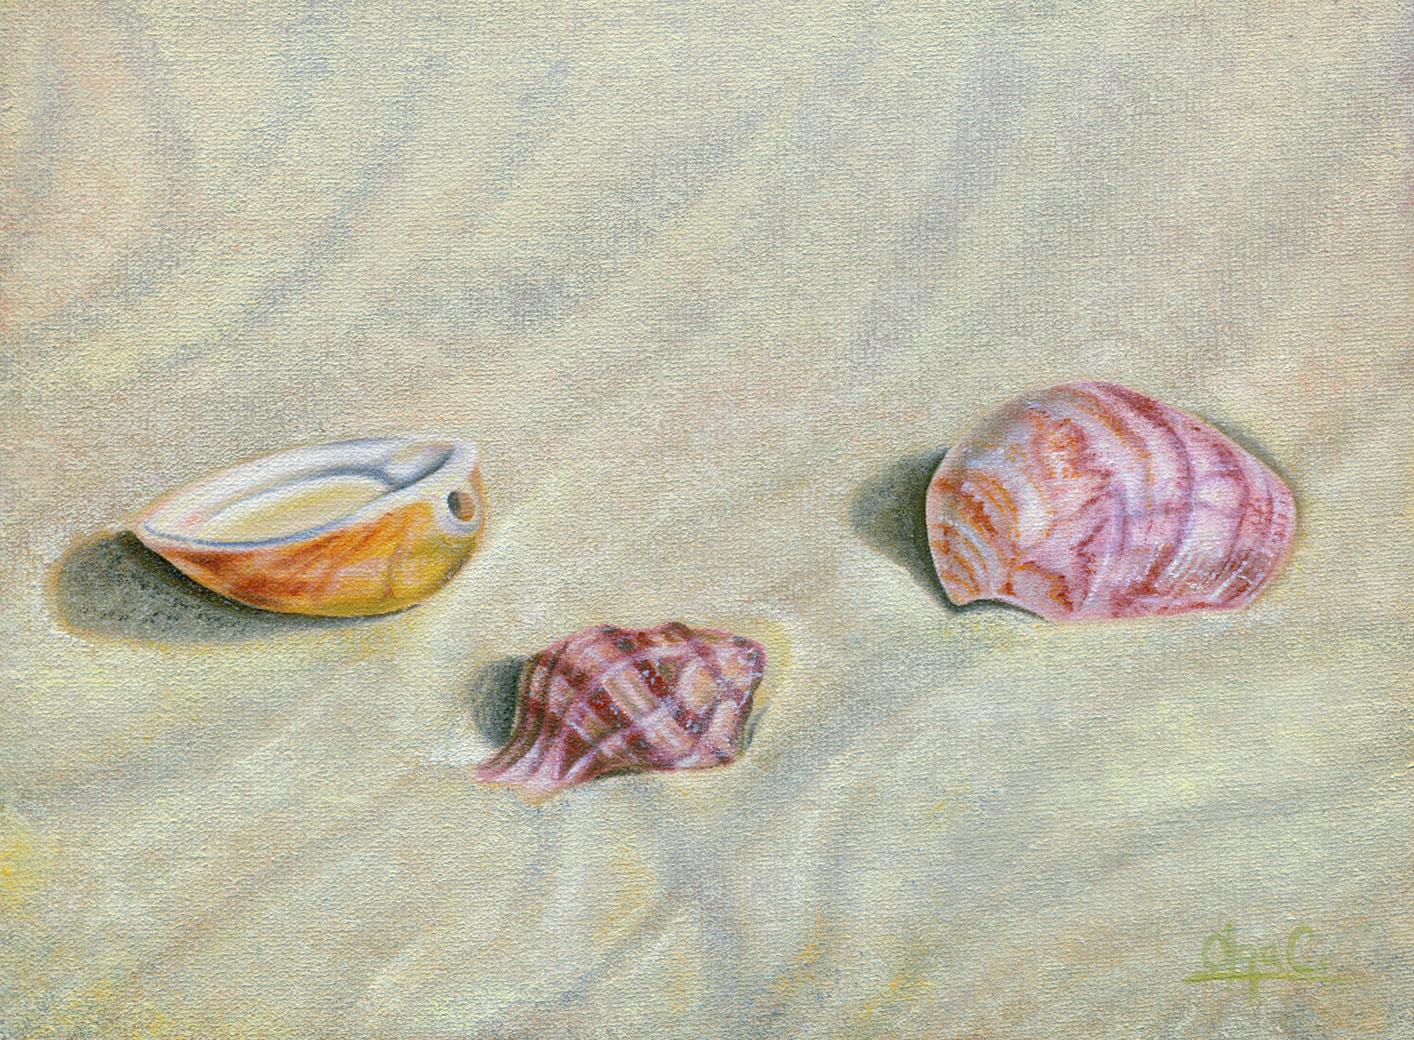 Little Shells on Dry Sand on the Beach